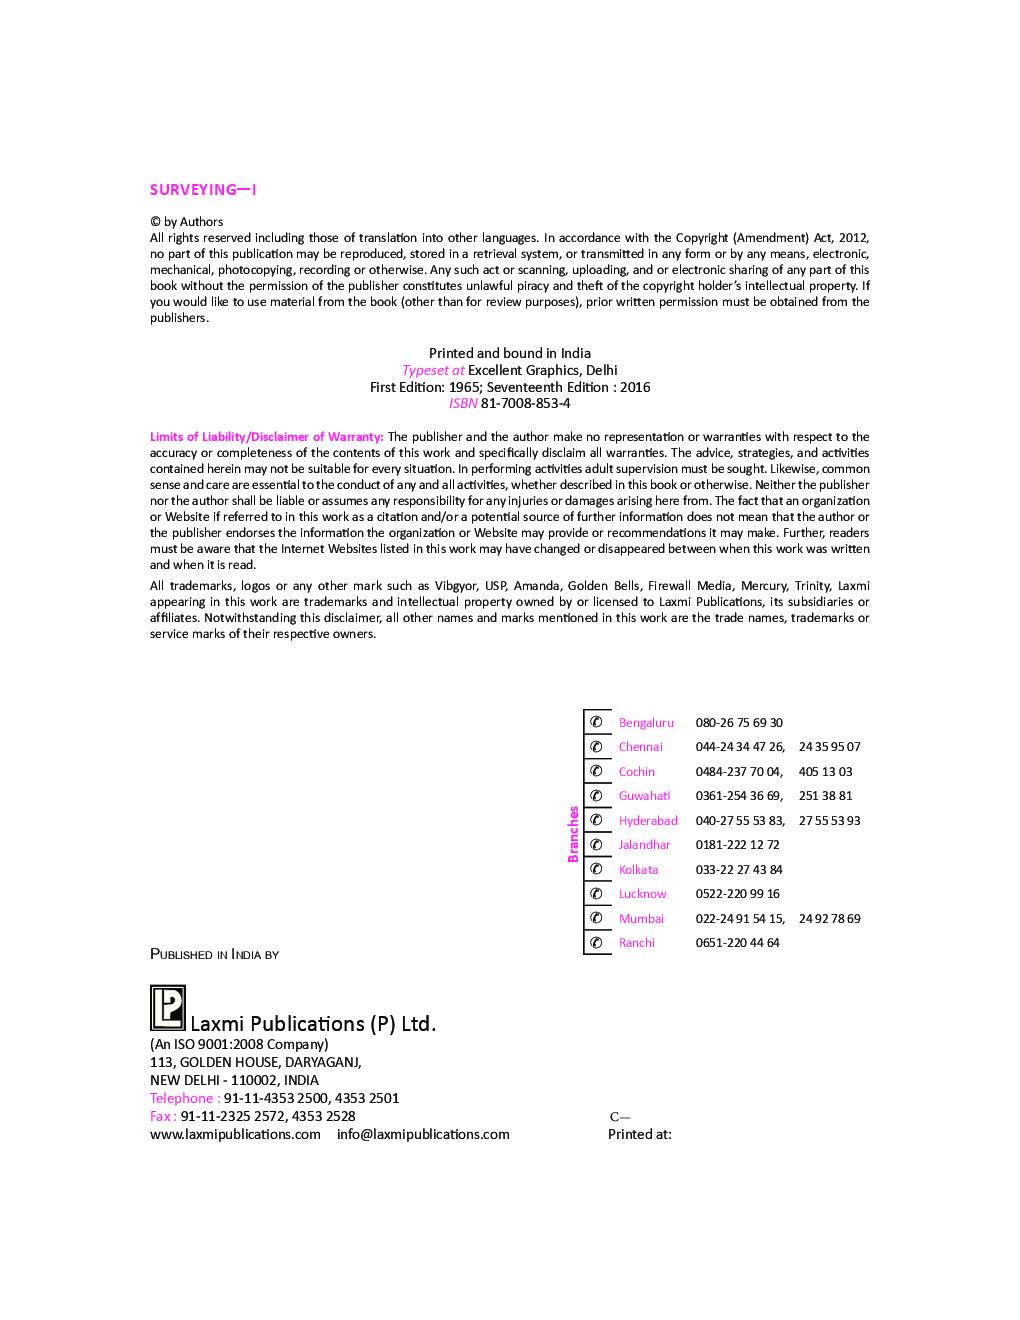 Surveying Vol. 1 - Page 5